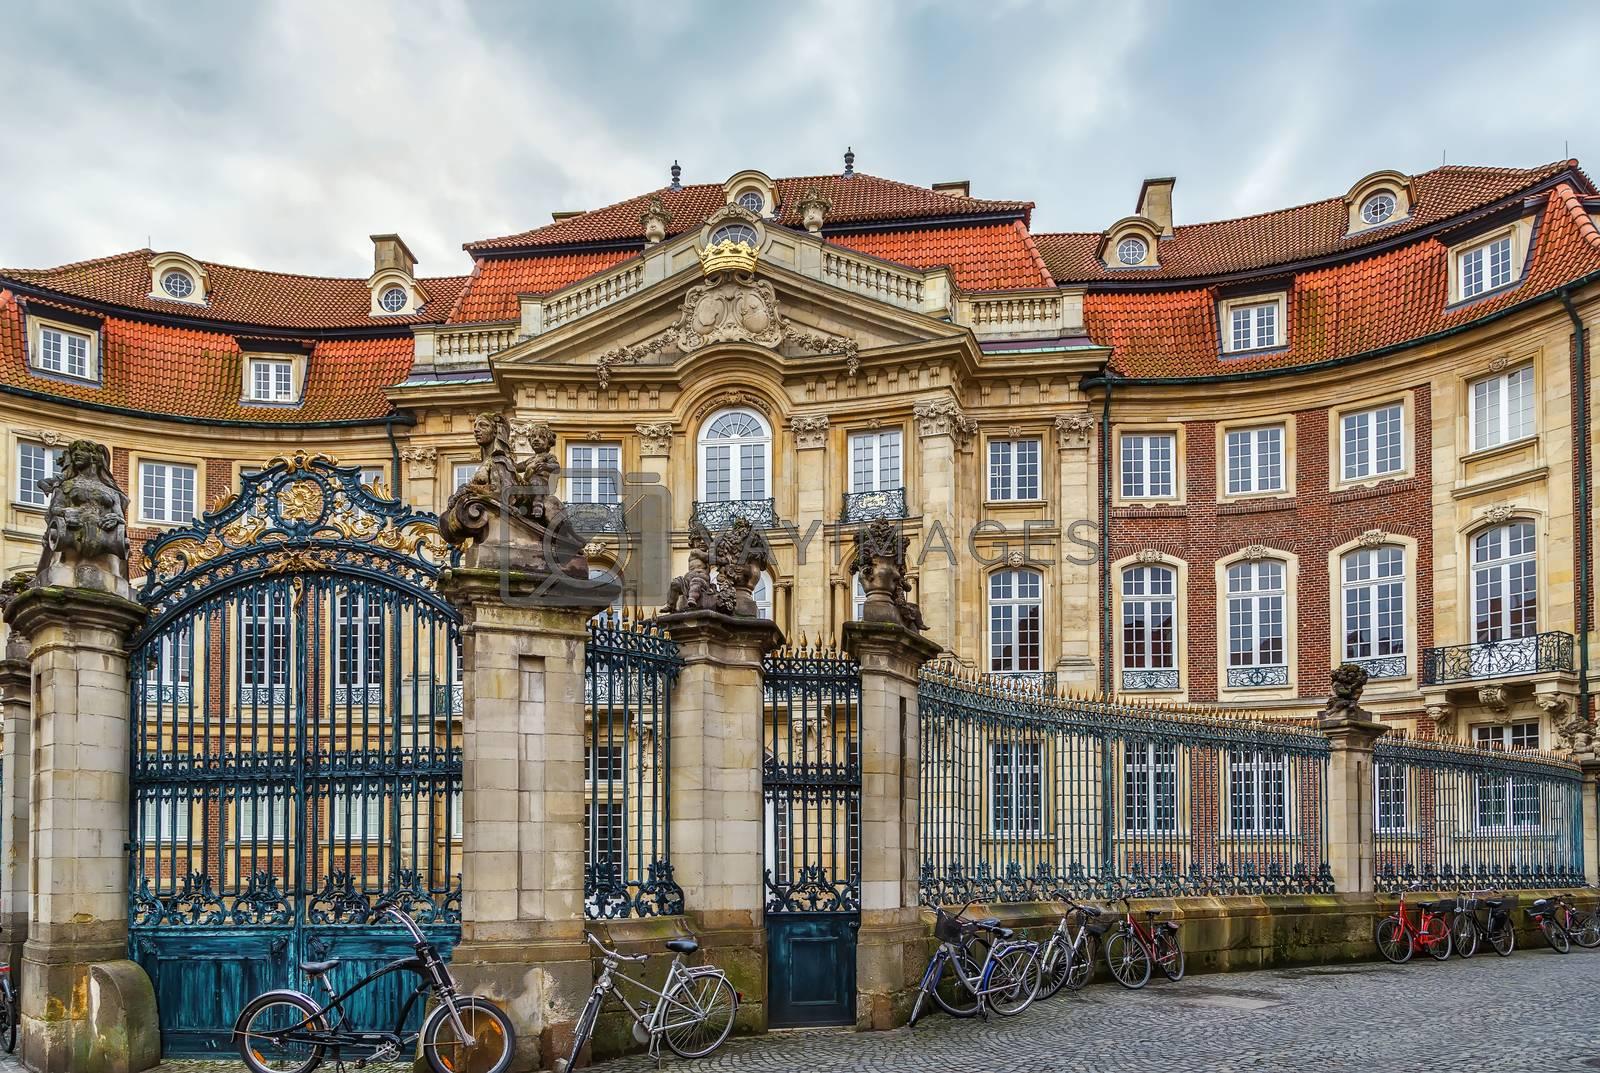 Royalty free image of Erbdrostenhof palace, Munster, Germany by borisb17